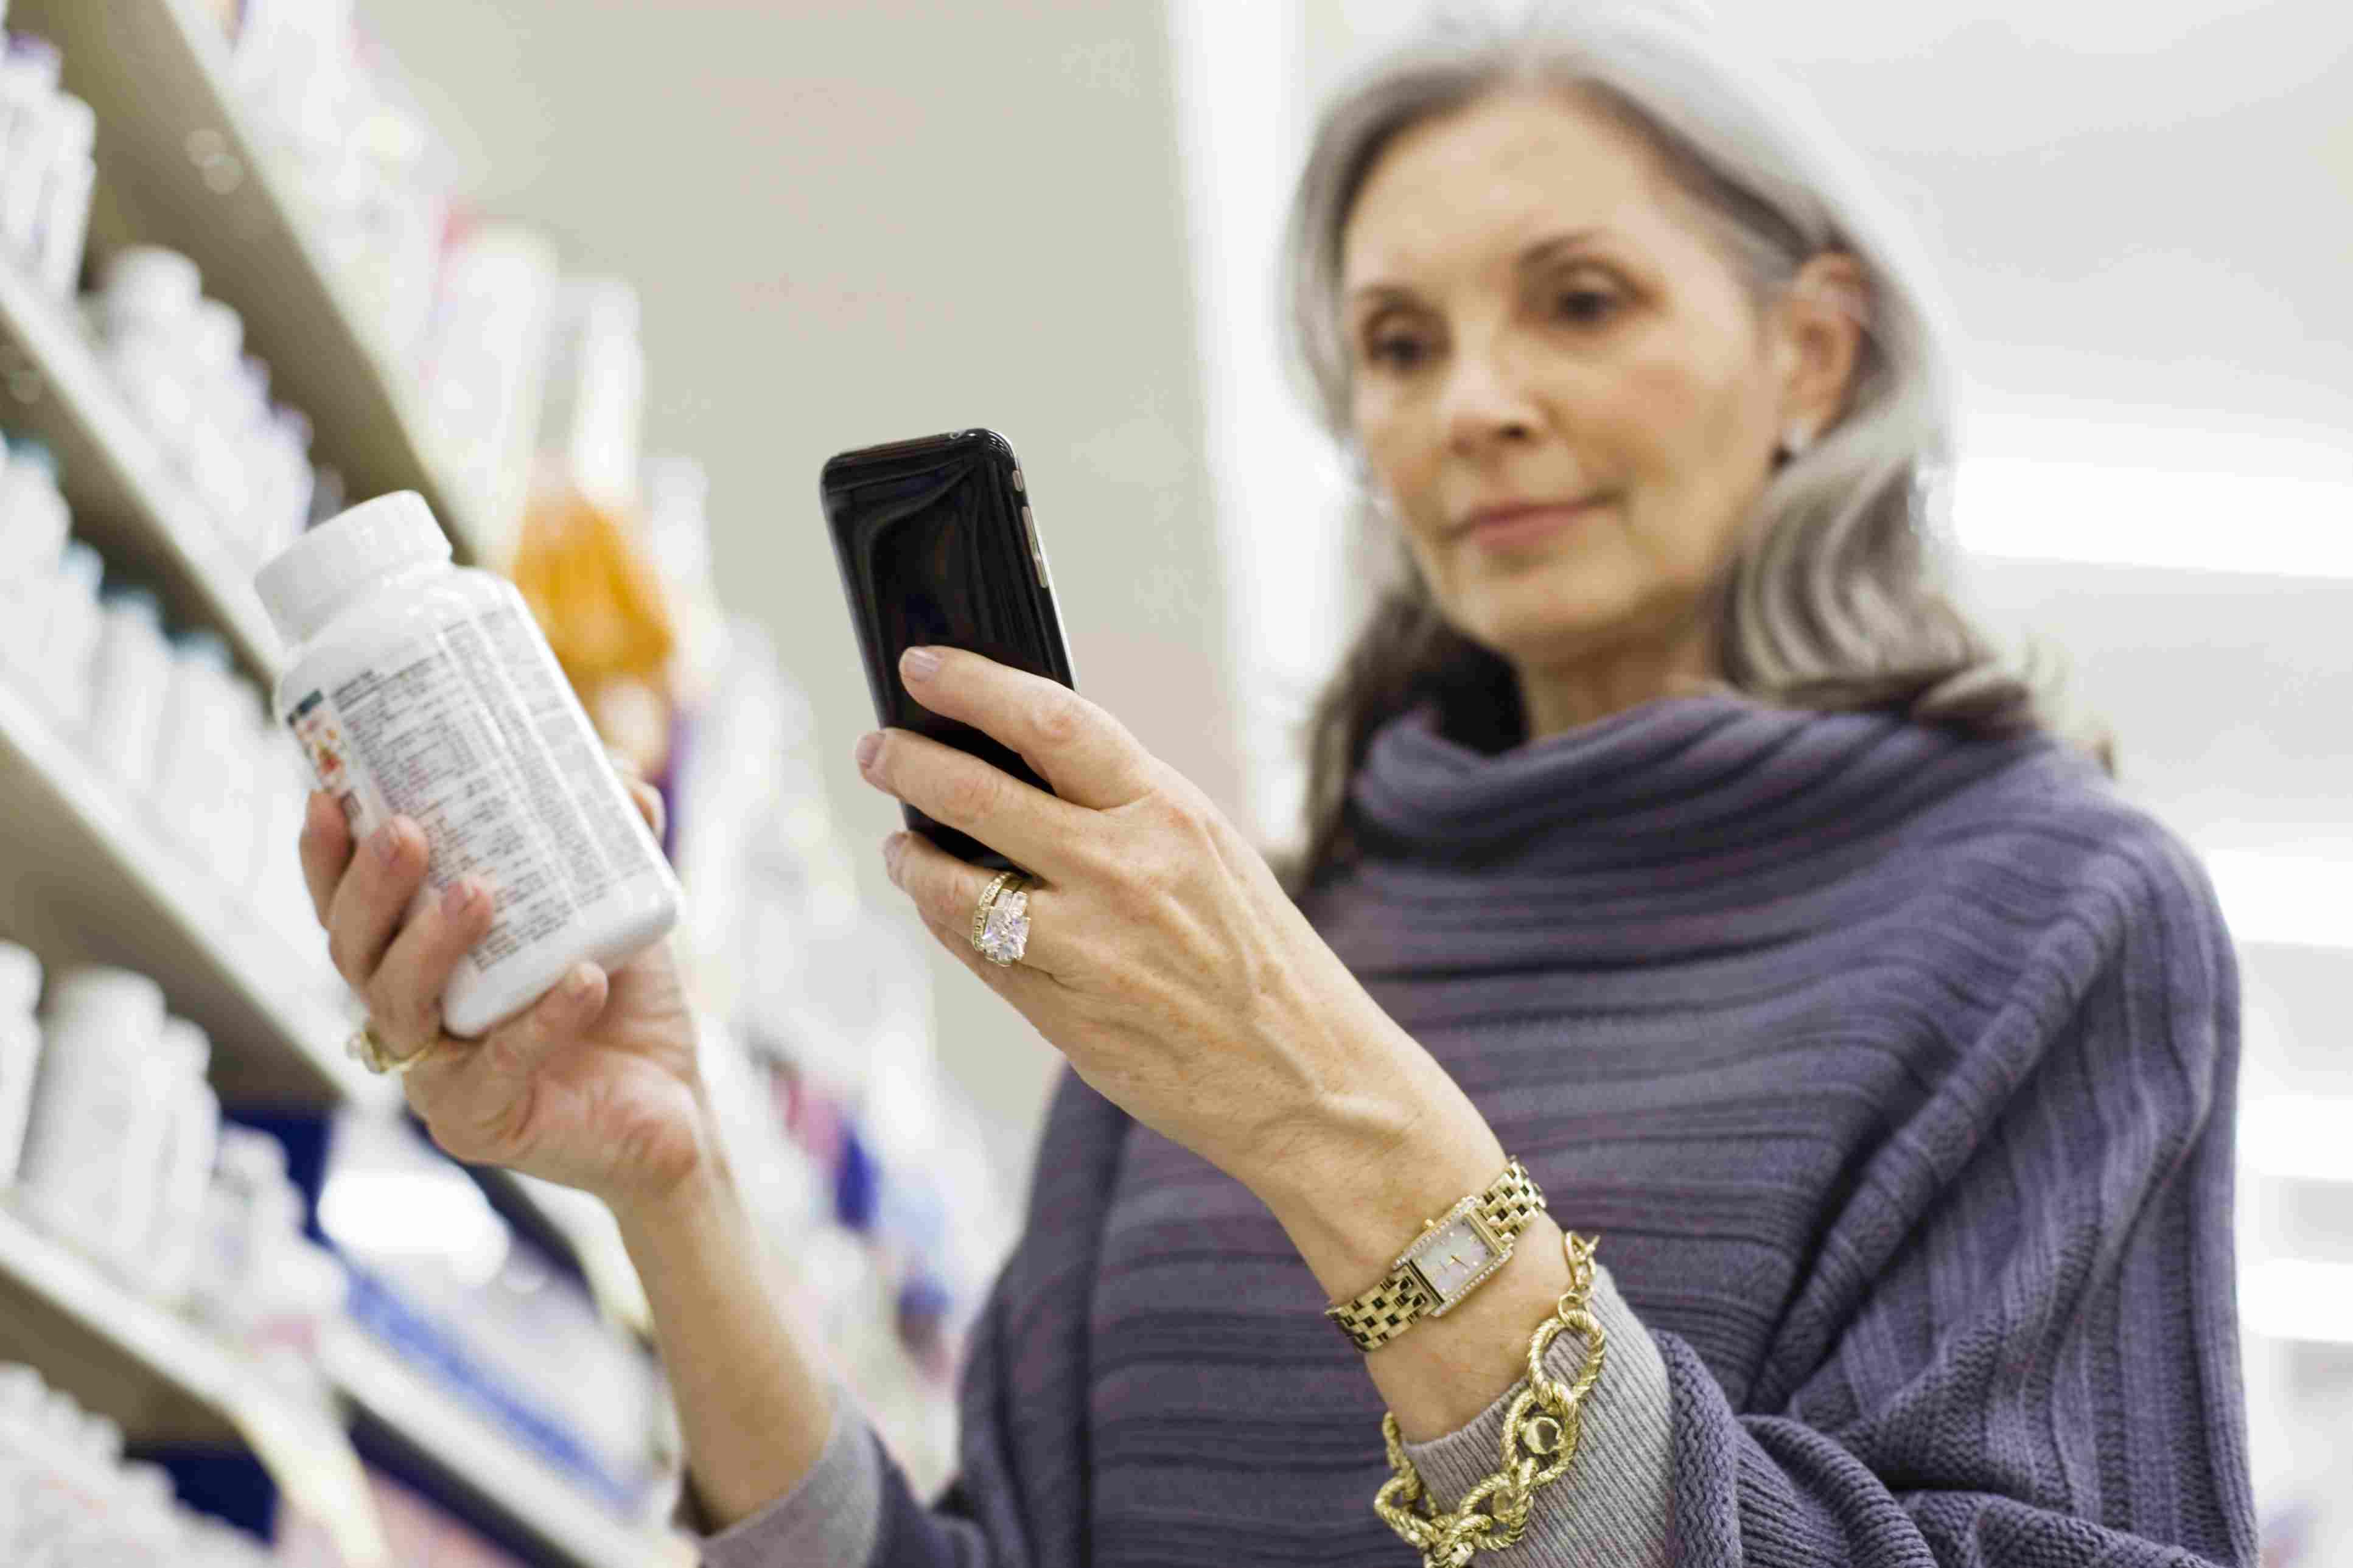 Senior woman reading medicine bottle